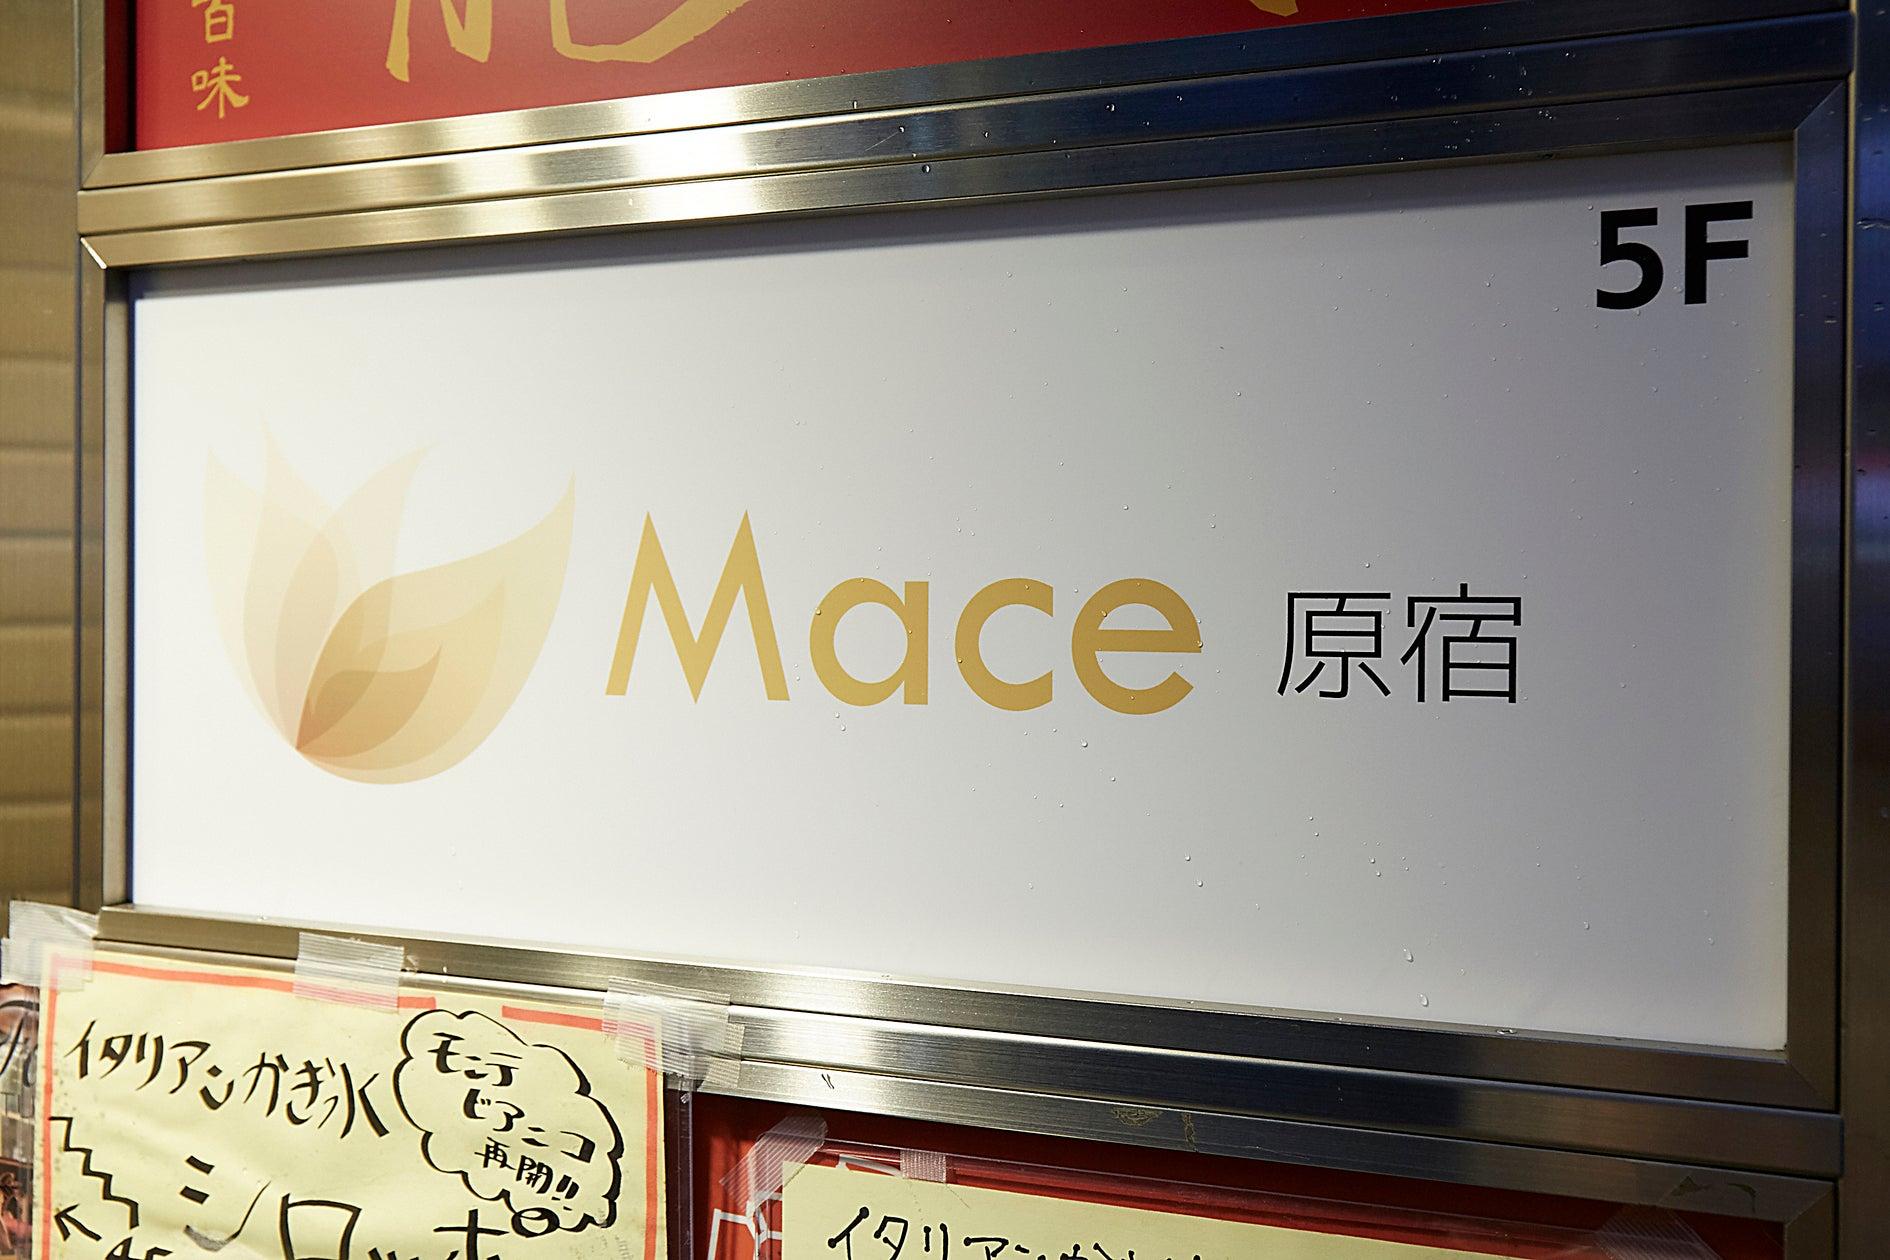 Mace原宿【竹下通り出口に位置する砂浜カフェ風スペース!】インドア花見装飾 の写真